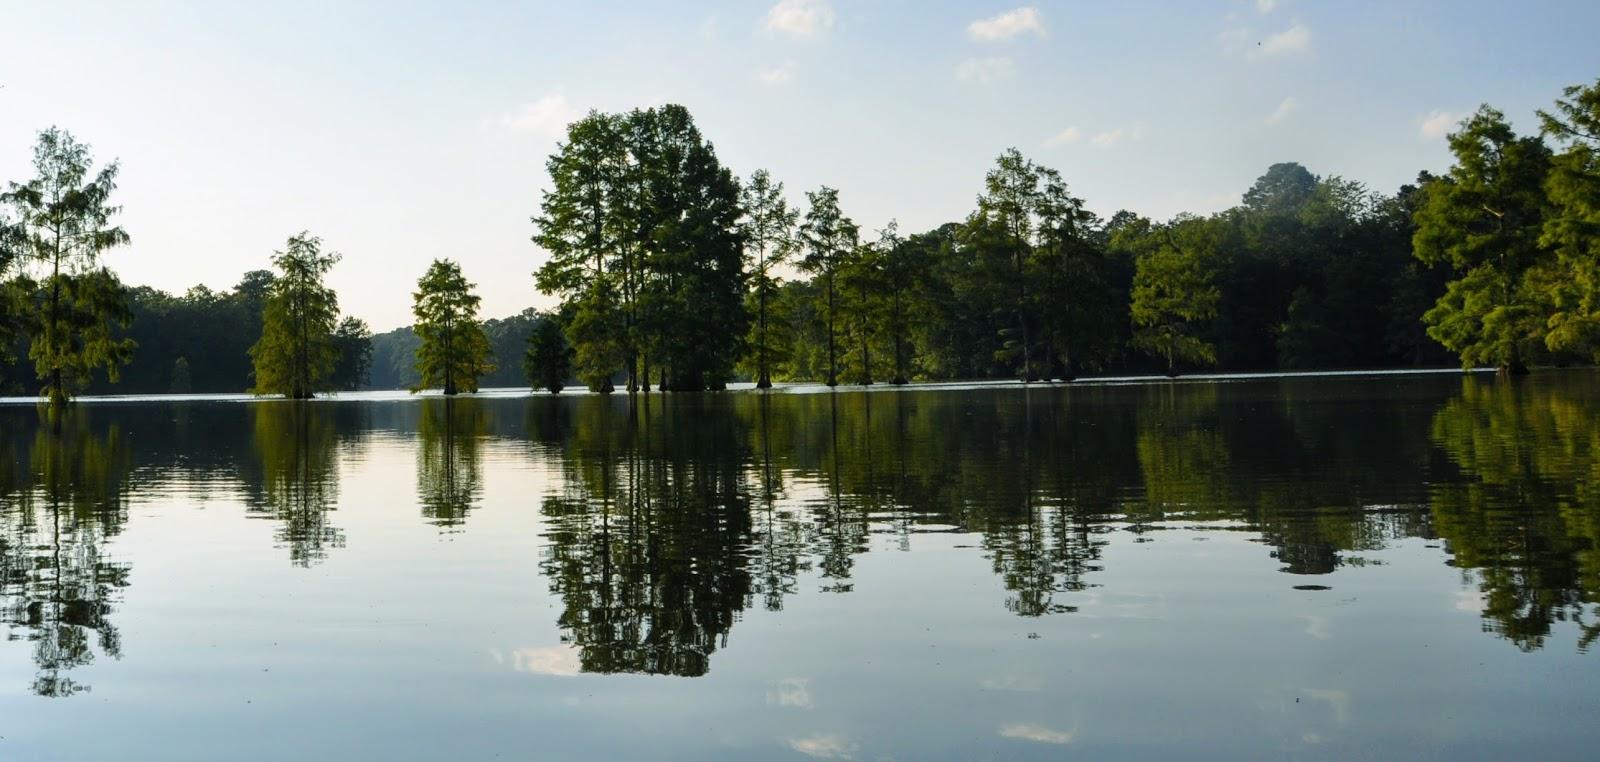 MidAtlantic DayTrips: Reflections on Trap Pond